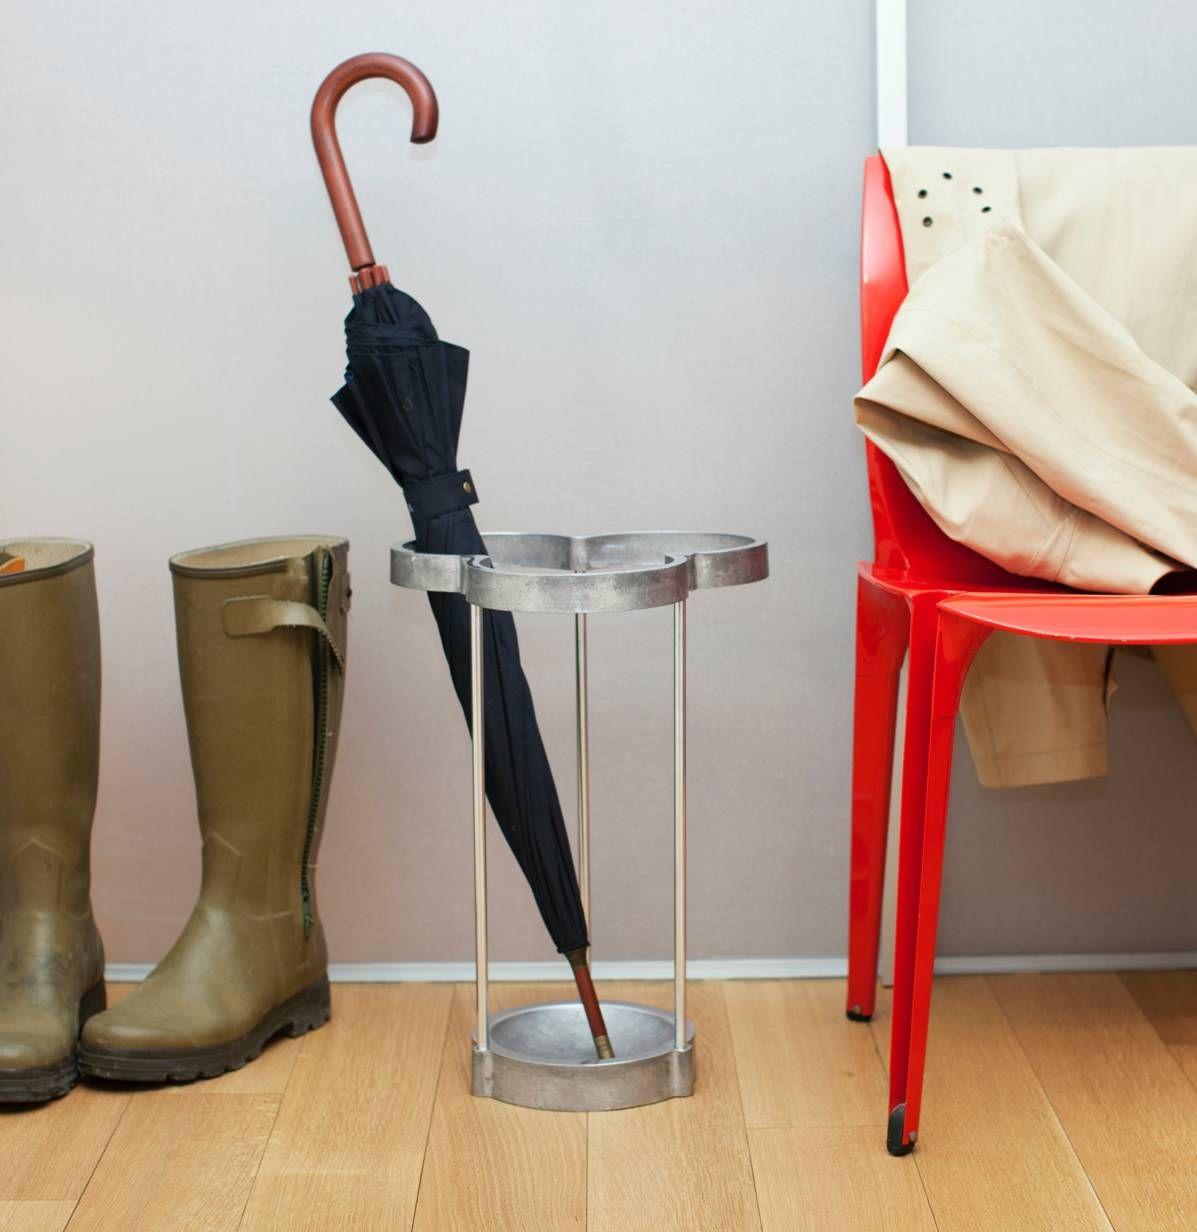 Emmanuela Frattini & Carl Magnusson - IVY umbrella stand #bestumbrella